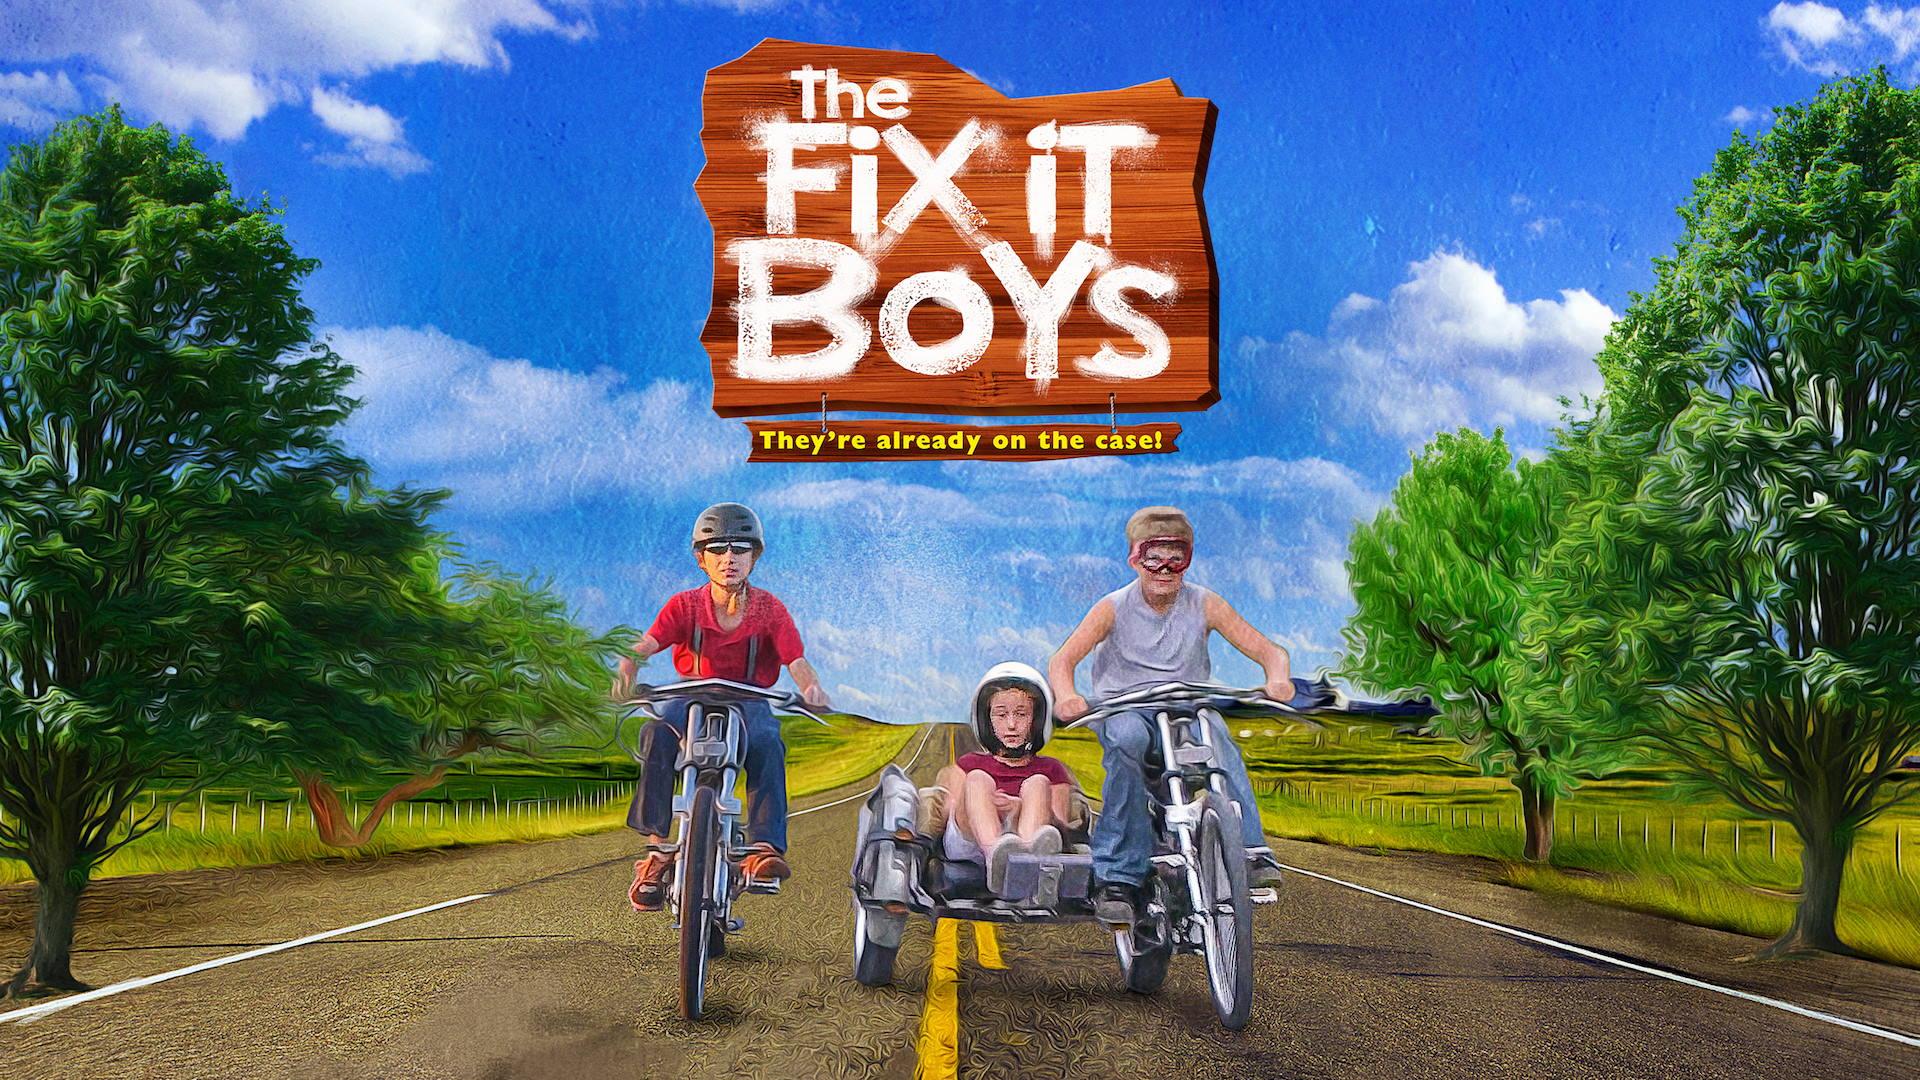 The Fix It Boys